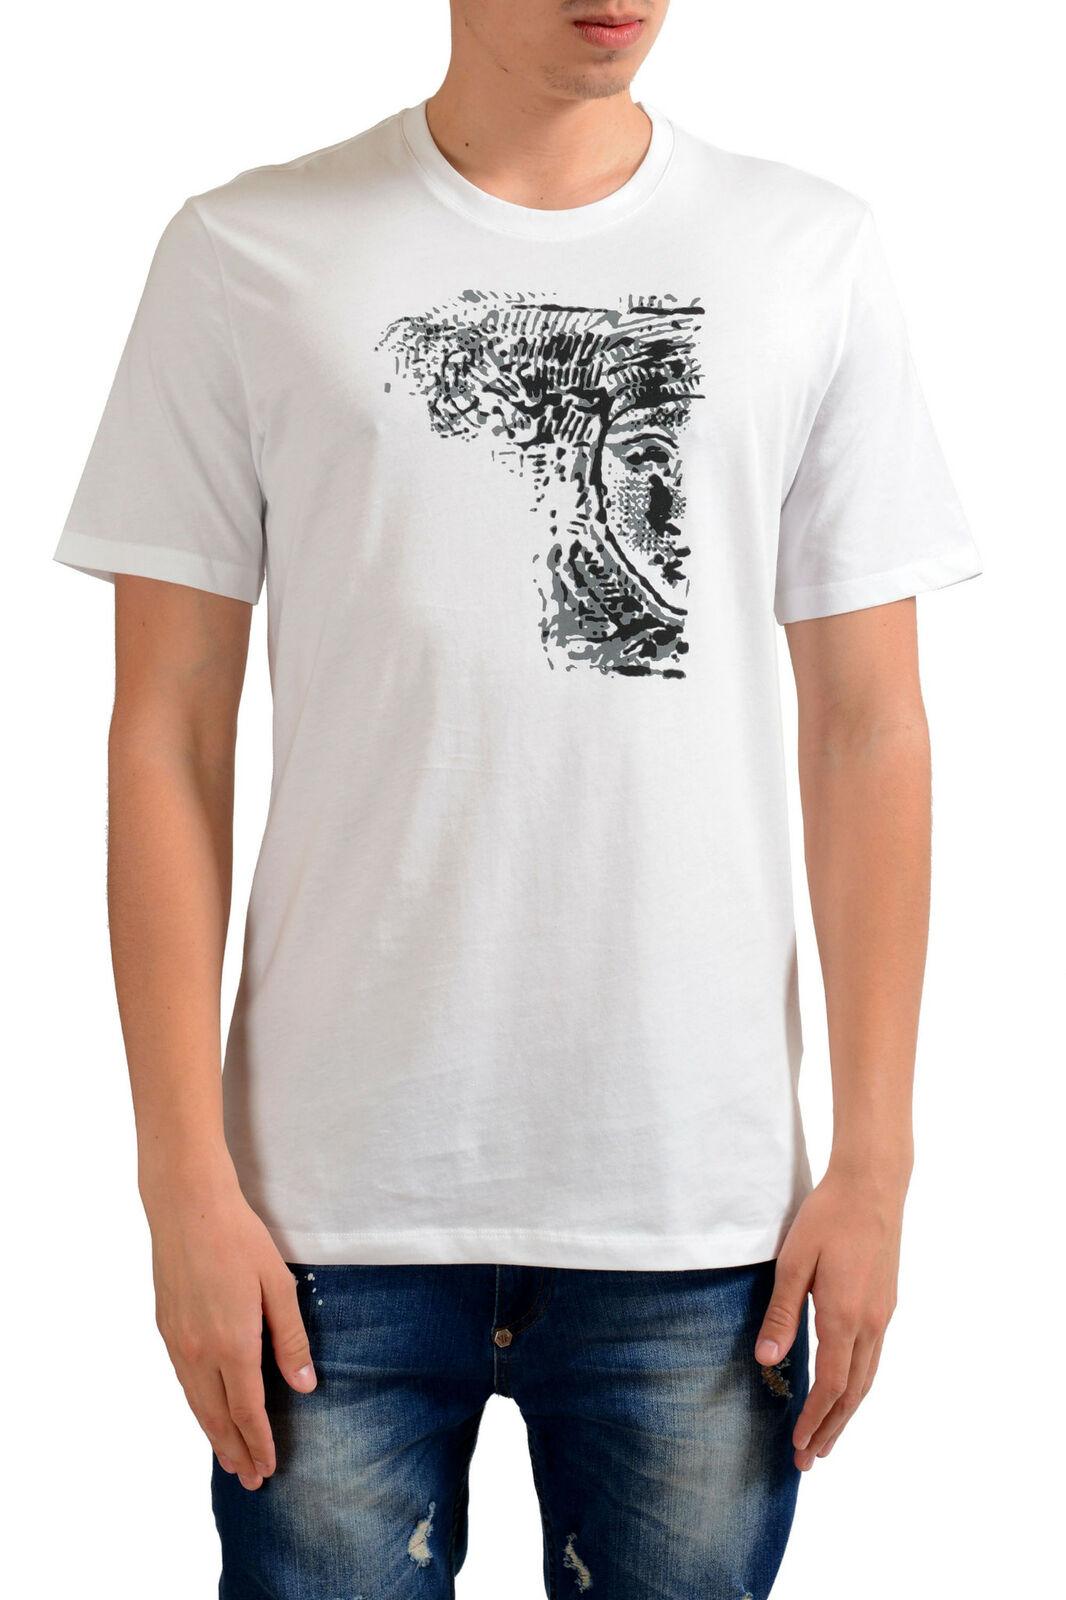 Versace Collection Uomo Bianco Stampa Grafica T-Shirt Taglie